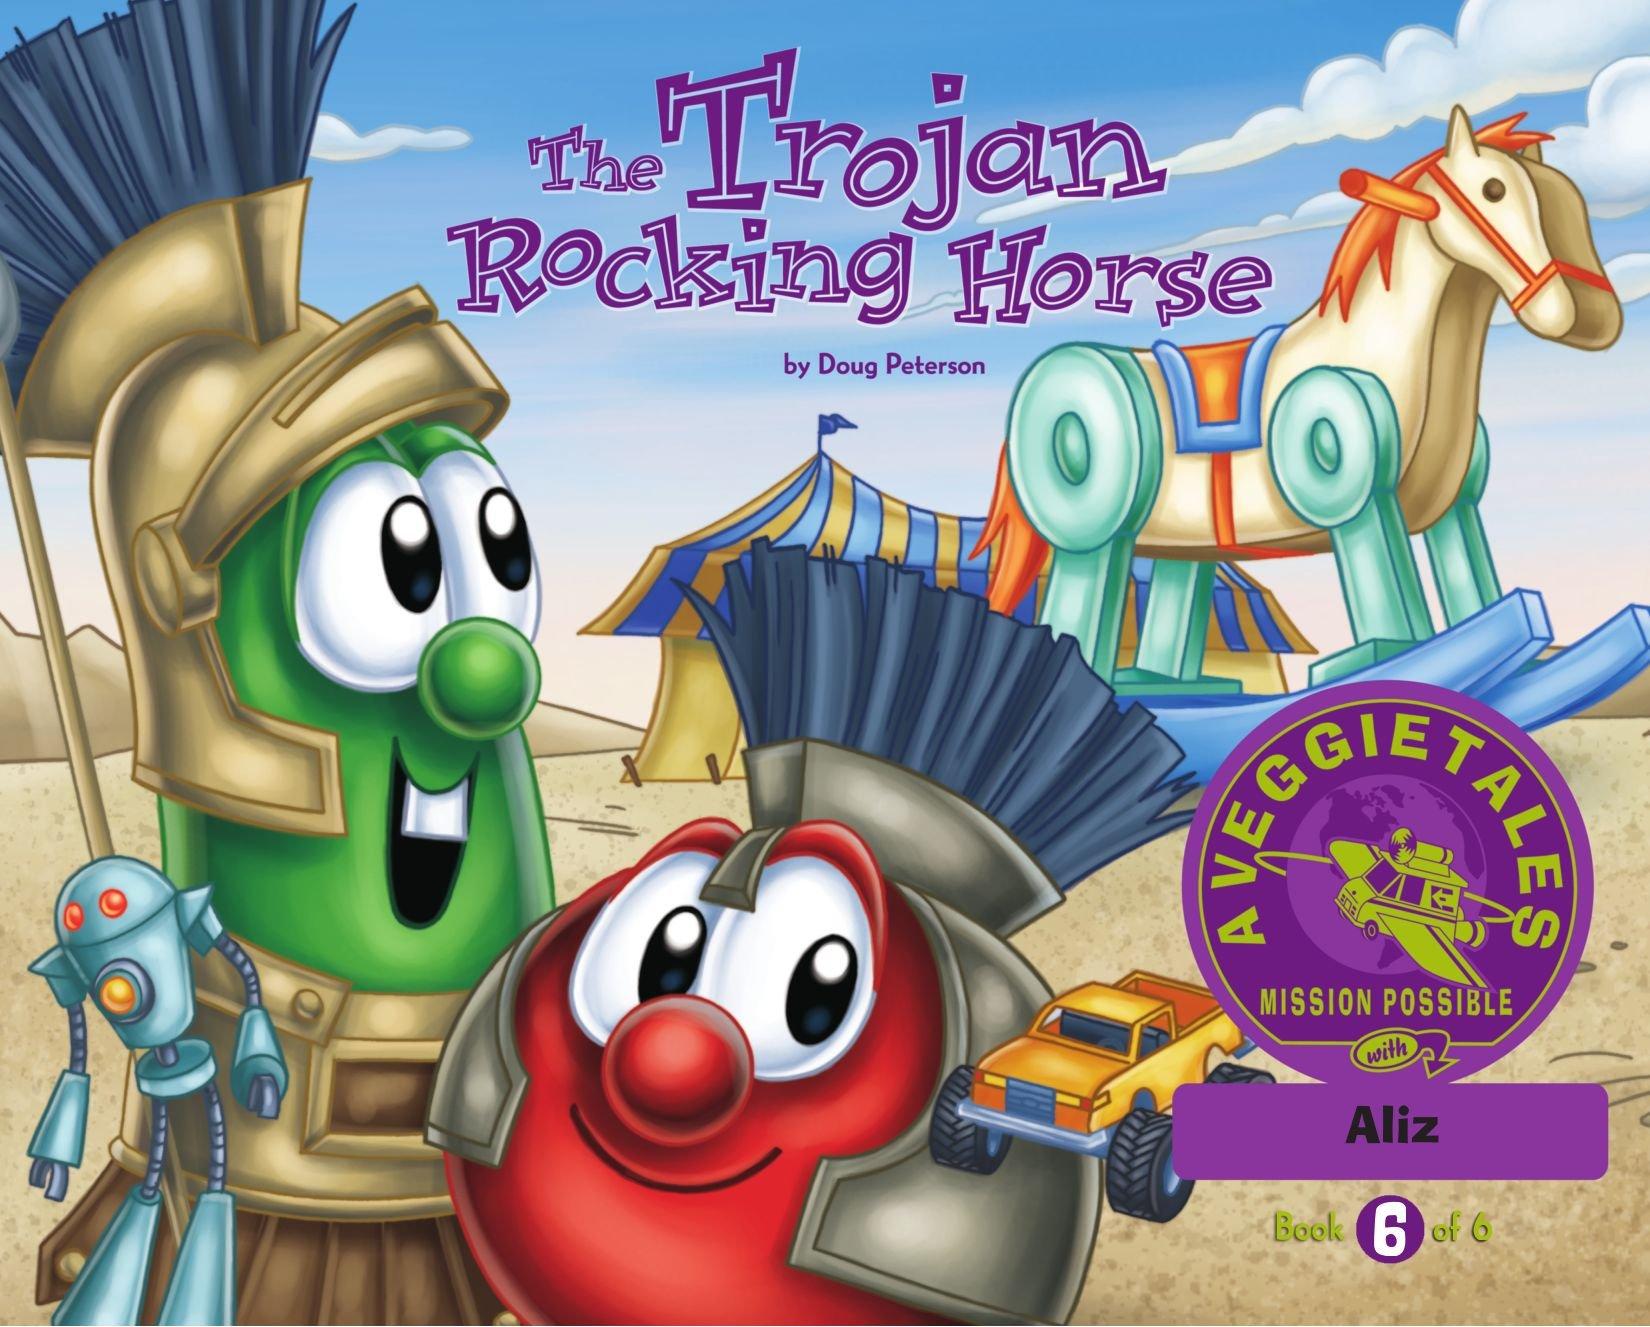 The Trojan Rocking Horse - VeggieTales Mission Possible Adventure Series #6: Personalized for Aliz (Boy) ebook